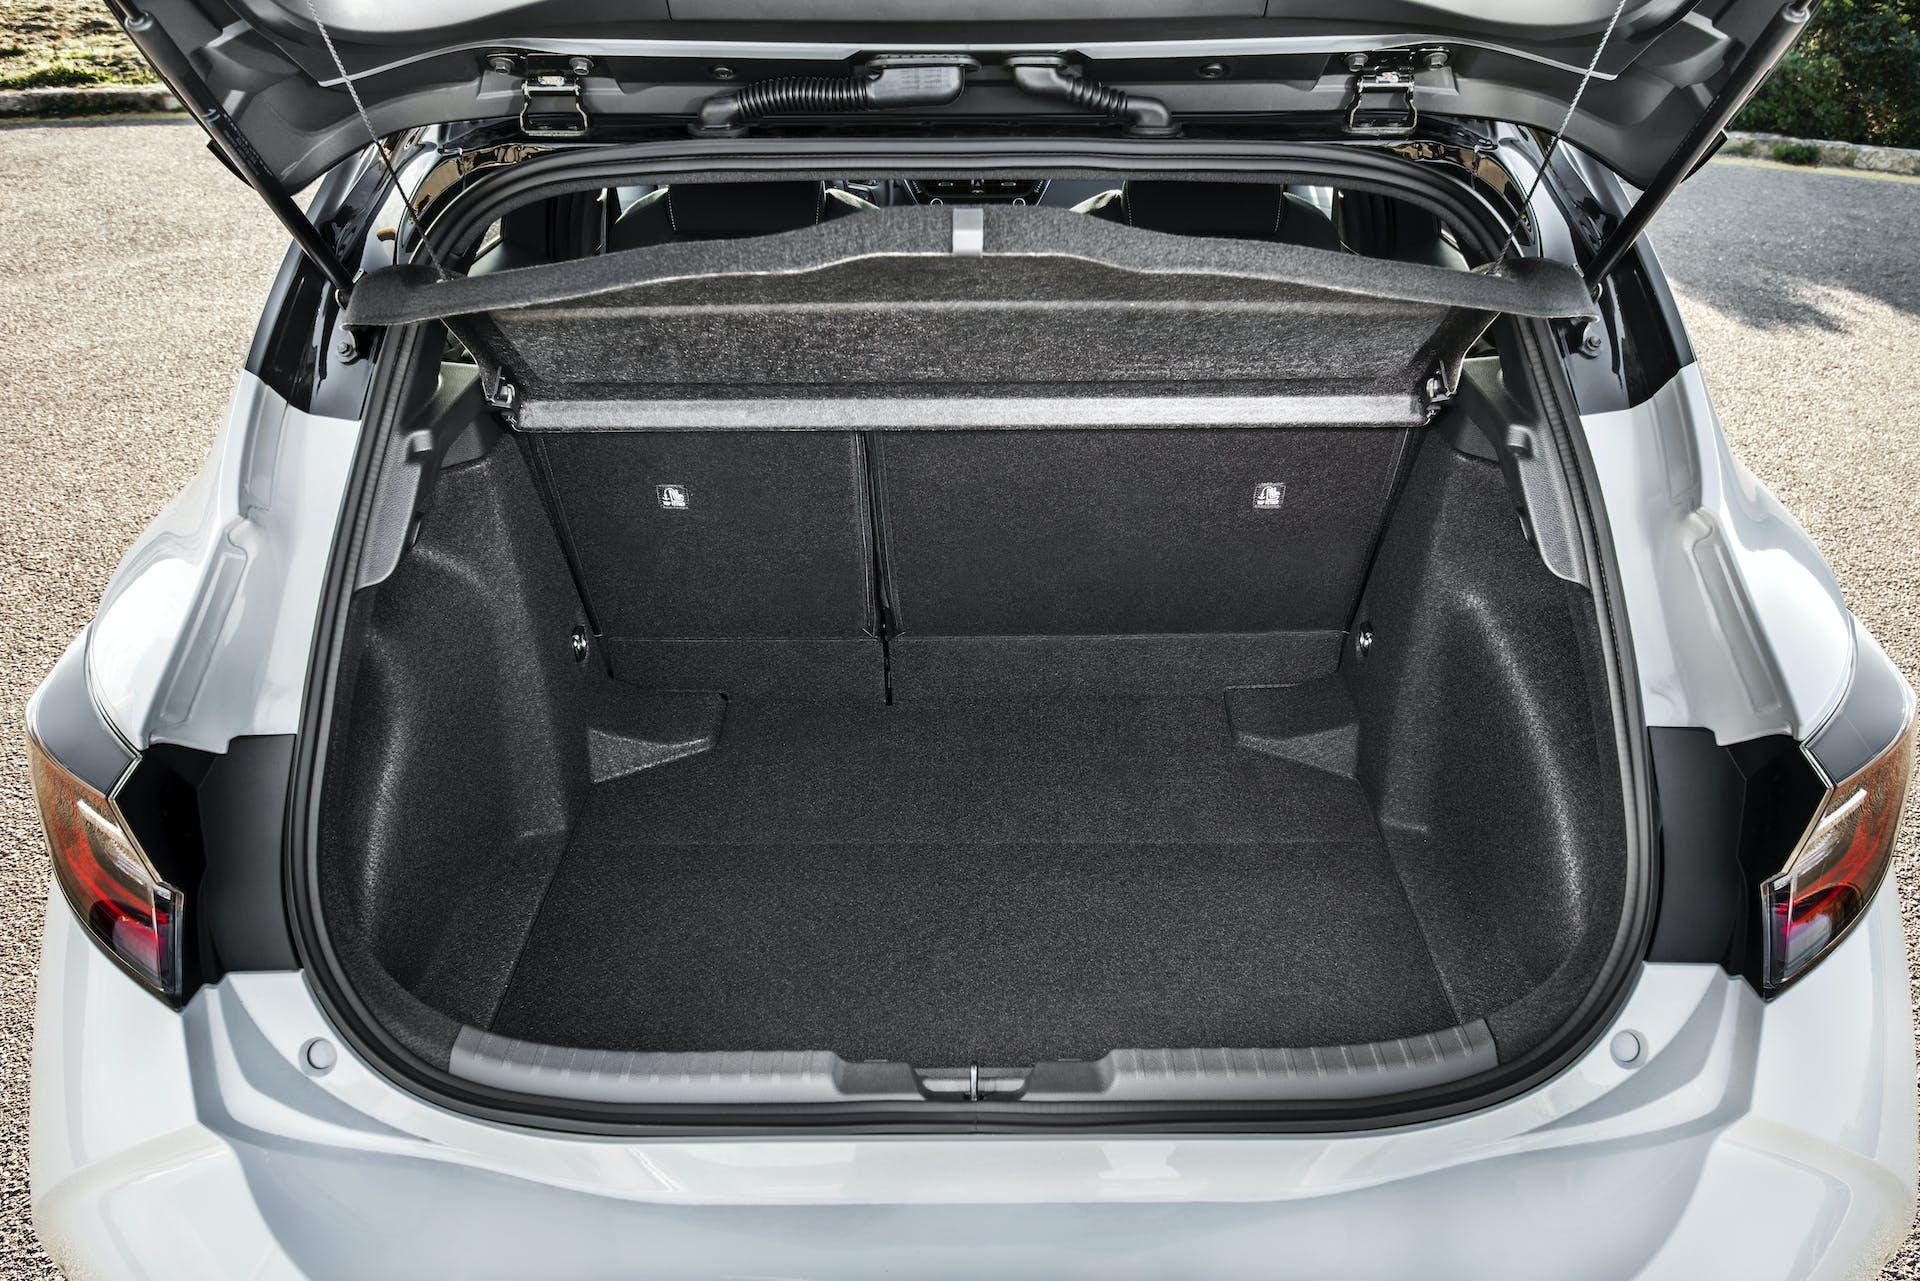 Toyota Corolla bagagliaio